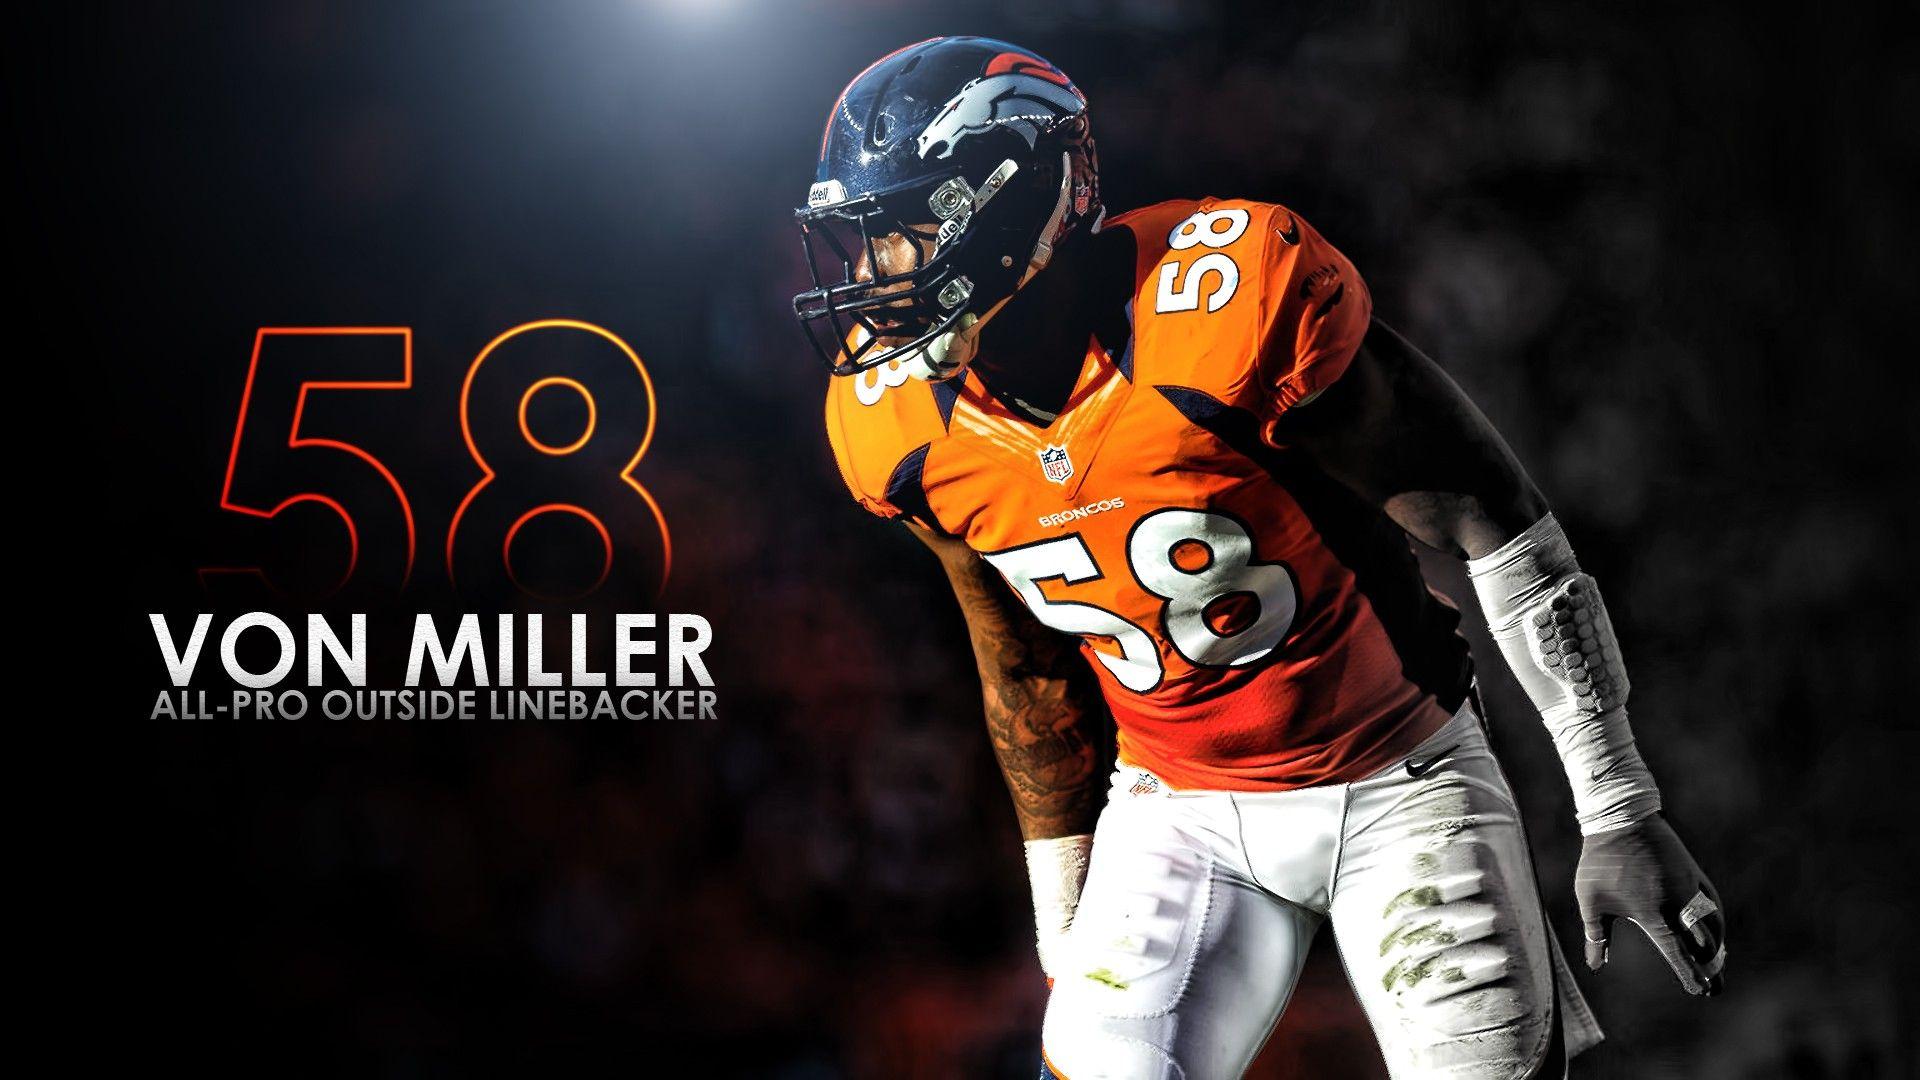 Von Miller Denver Broncos Wallpaper Hd 2021 Nfl Football Wallpapers Nfl Football Wallpaper Denver Broncos Denver Broncos Wallpaper